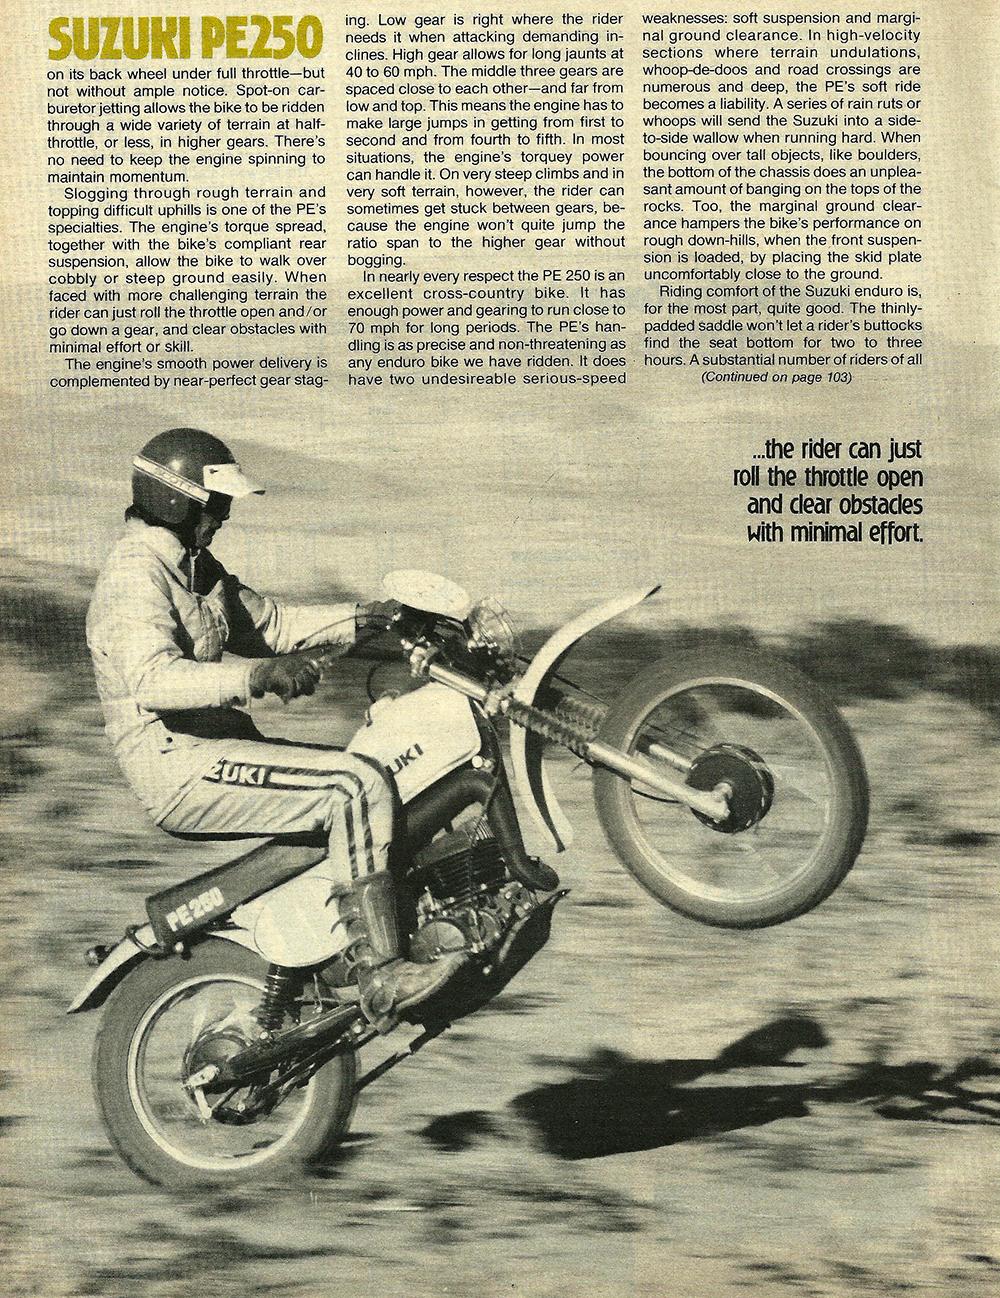 1977 Suzuki PE250 road test 5.jpg